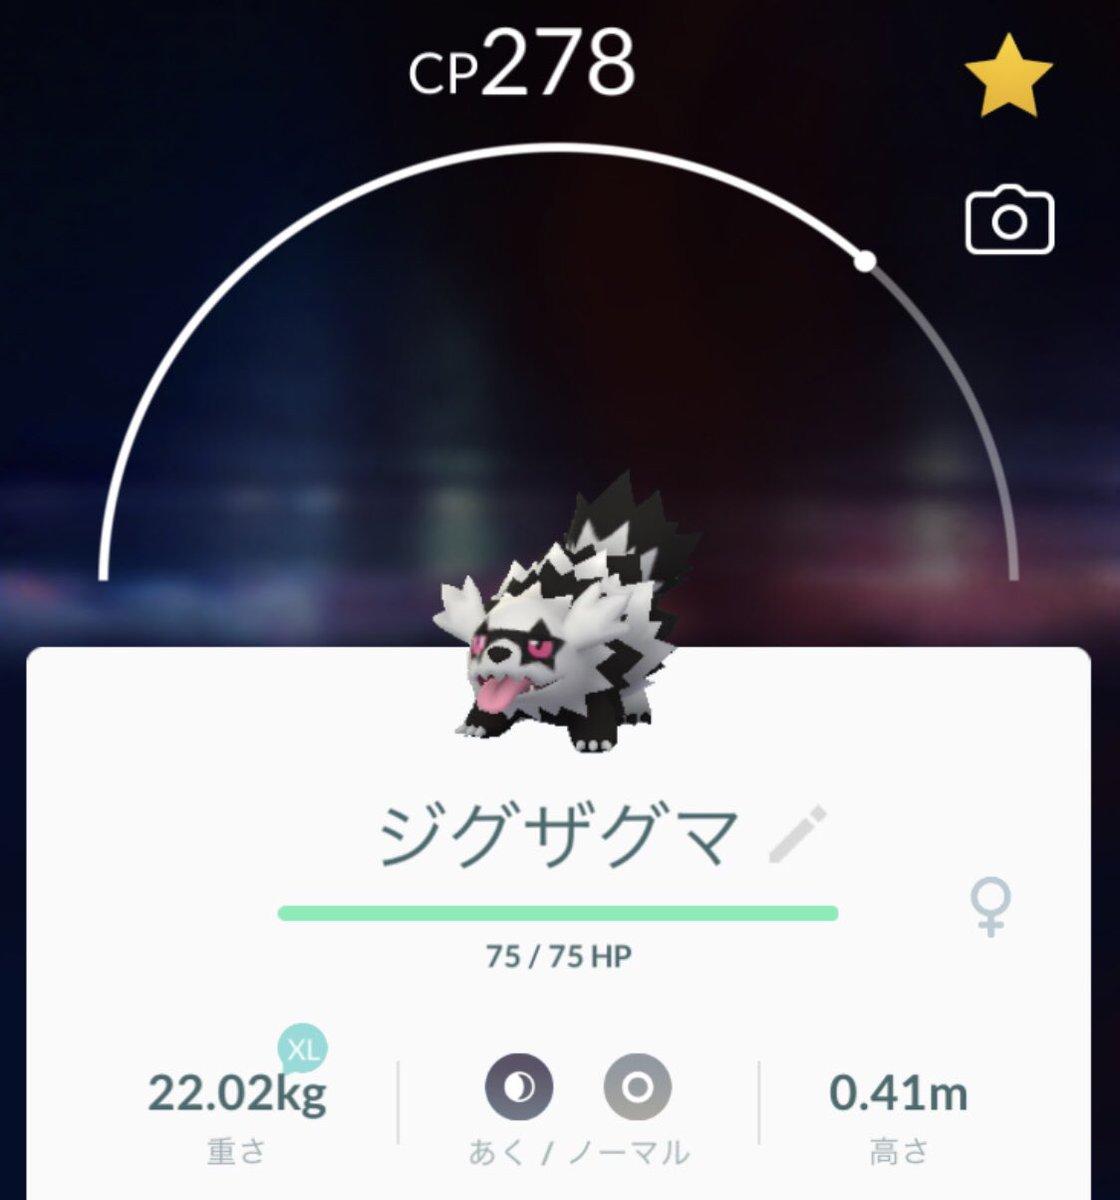 test ツイッターメディア - ポケモンGO☆進化〜( ̄∇ ̄) https://t.co/VlEPPCiBie